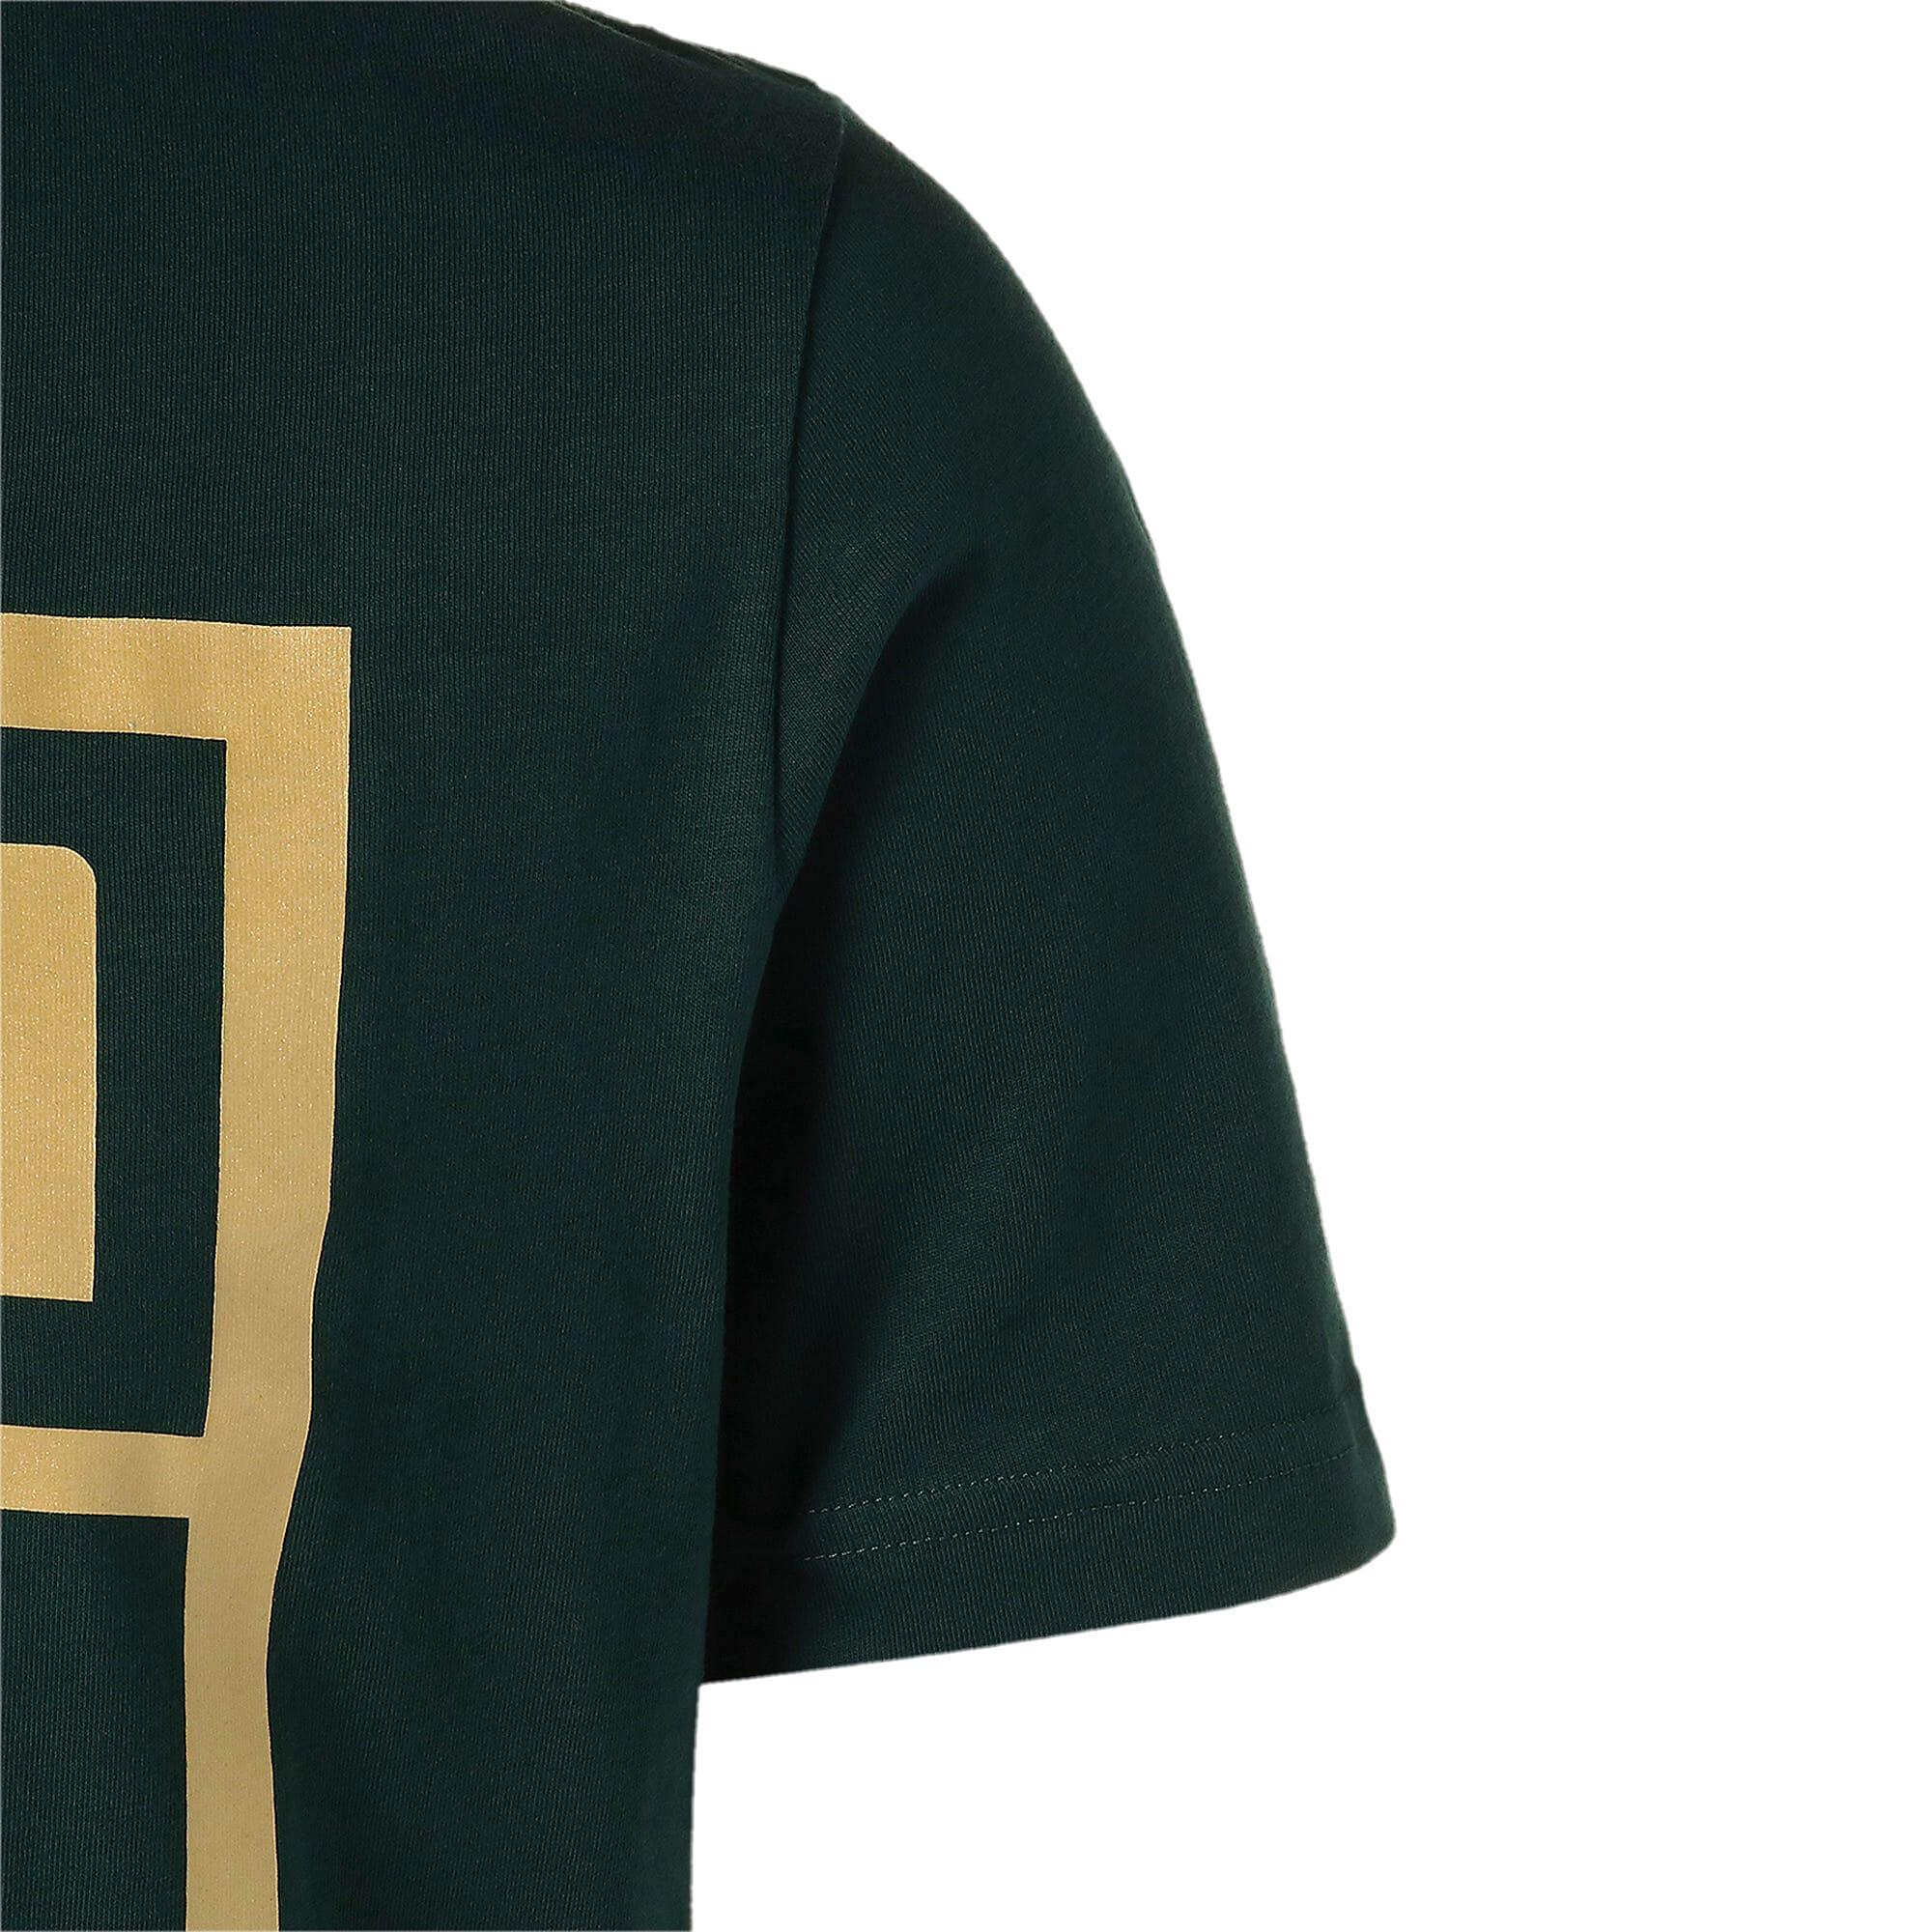 Thumbnail 5 of FIGC イタリア PUMA DNA Tシャツ 半袖, Ponderosa Pine-Team gold, medium-JPN